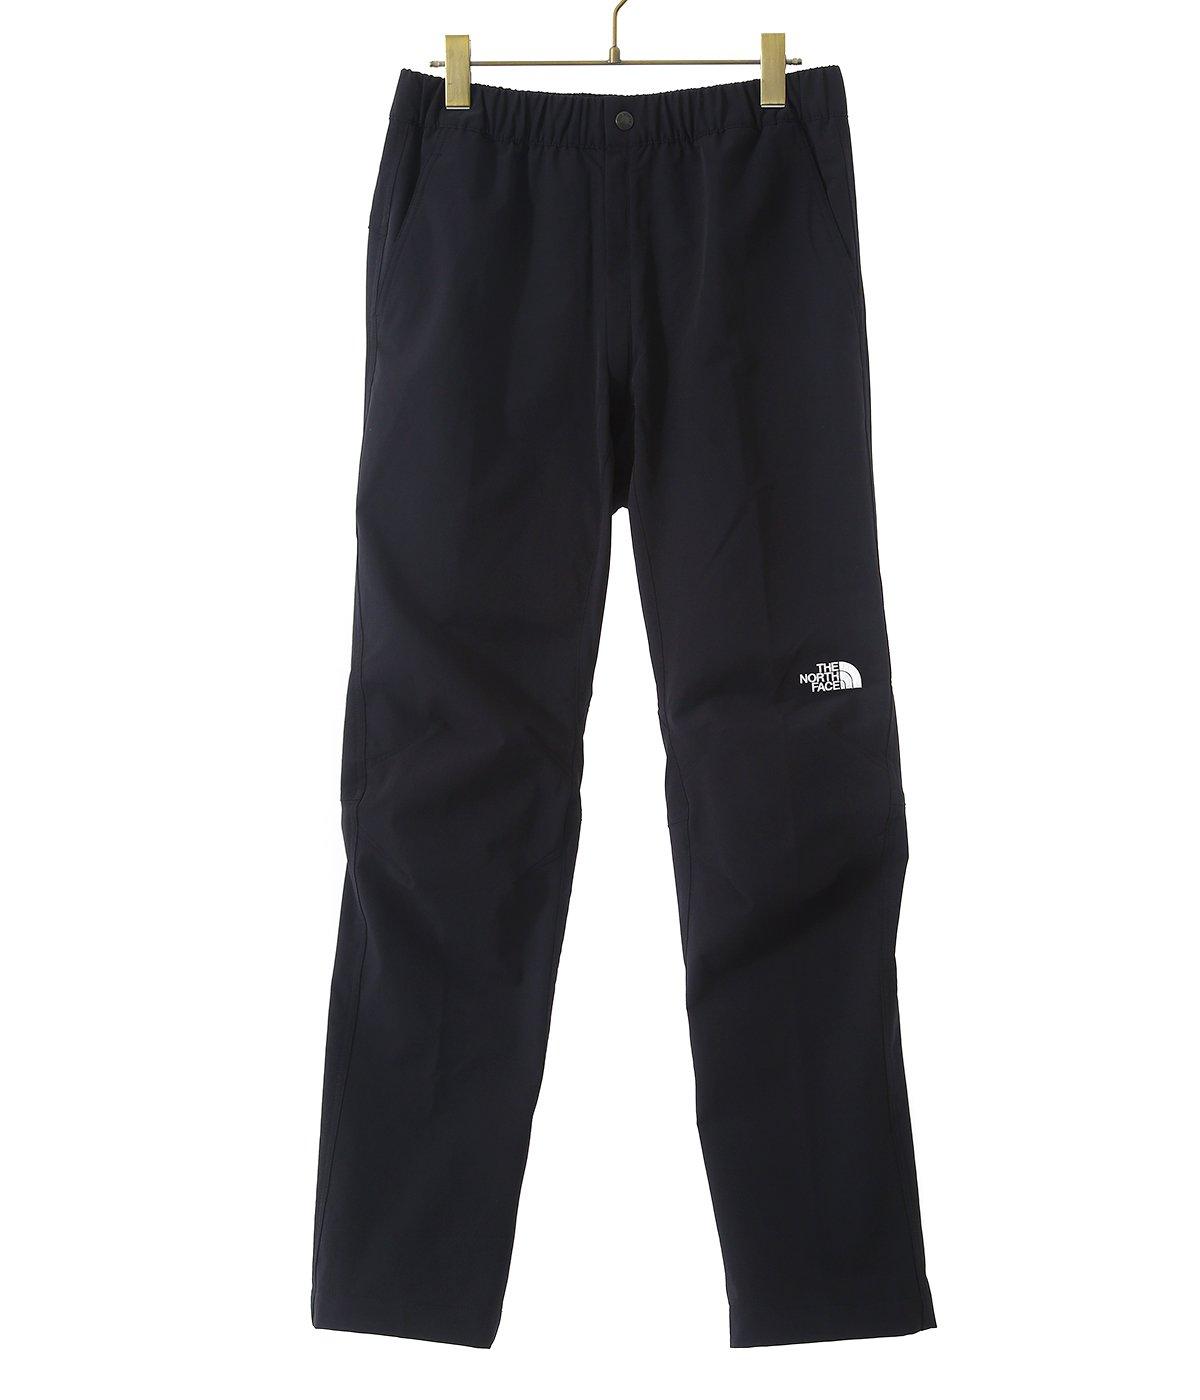 Doro Light pants